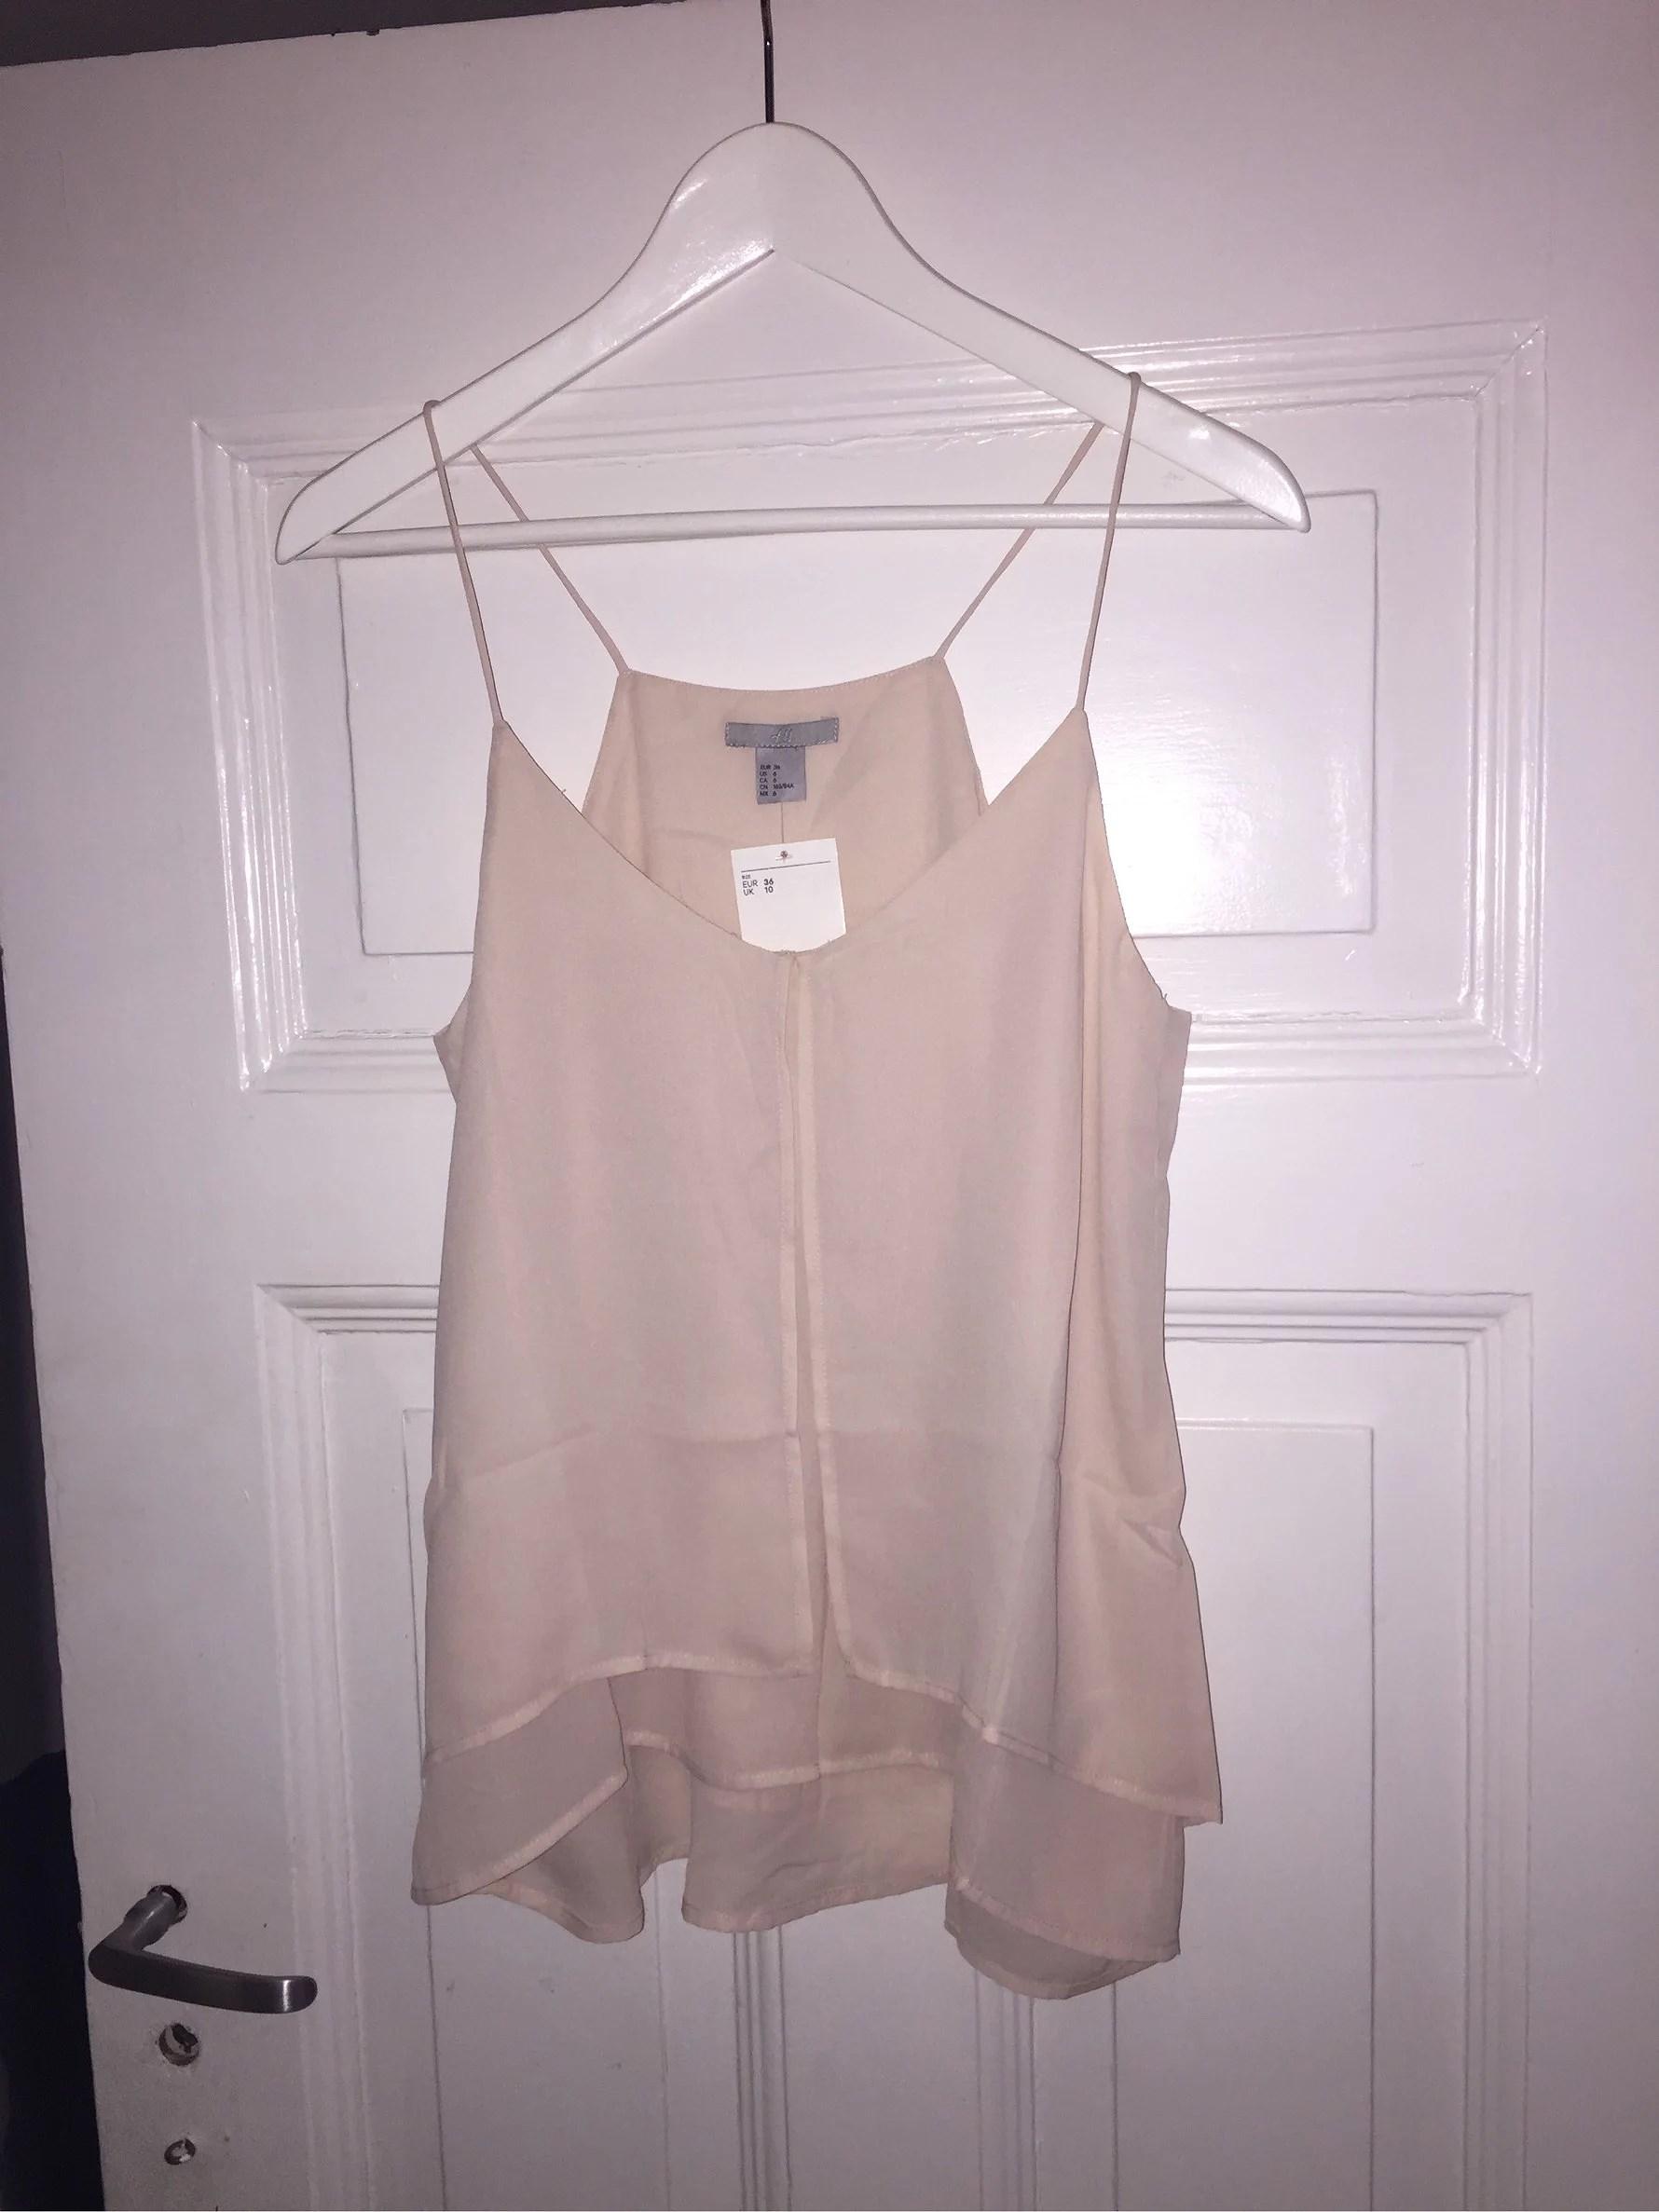 Beställt kläder